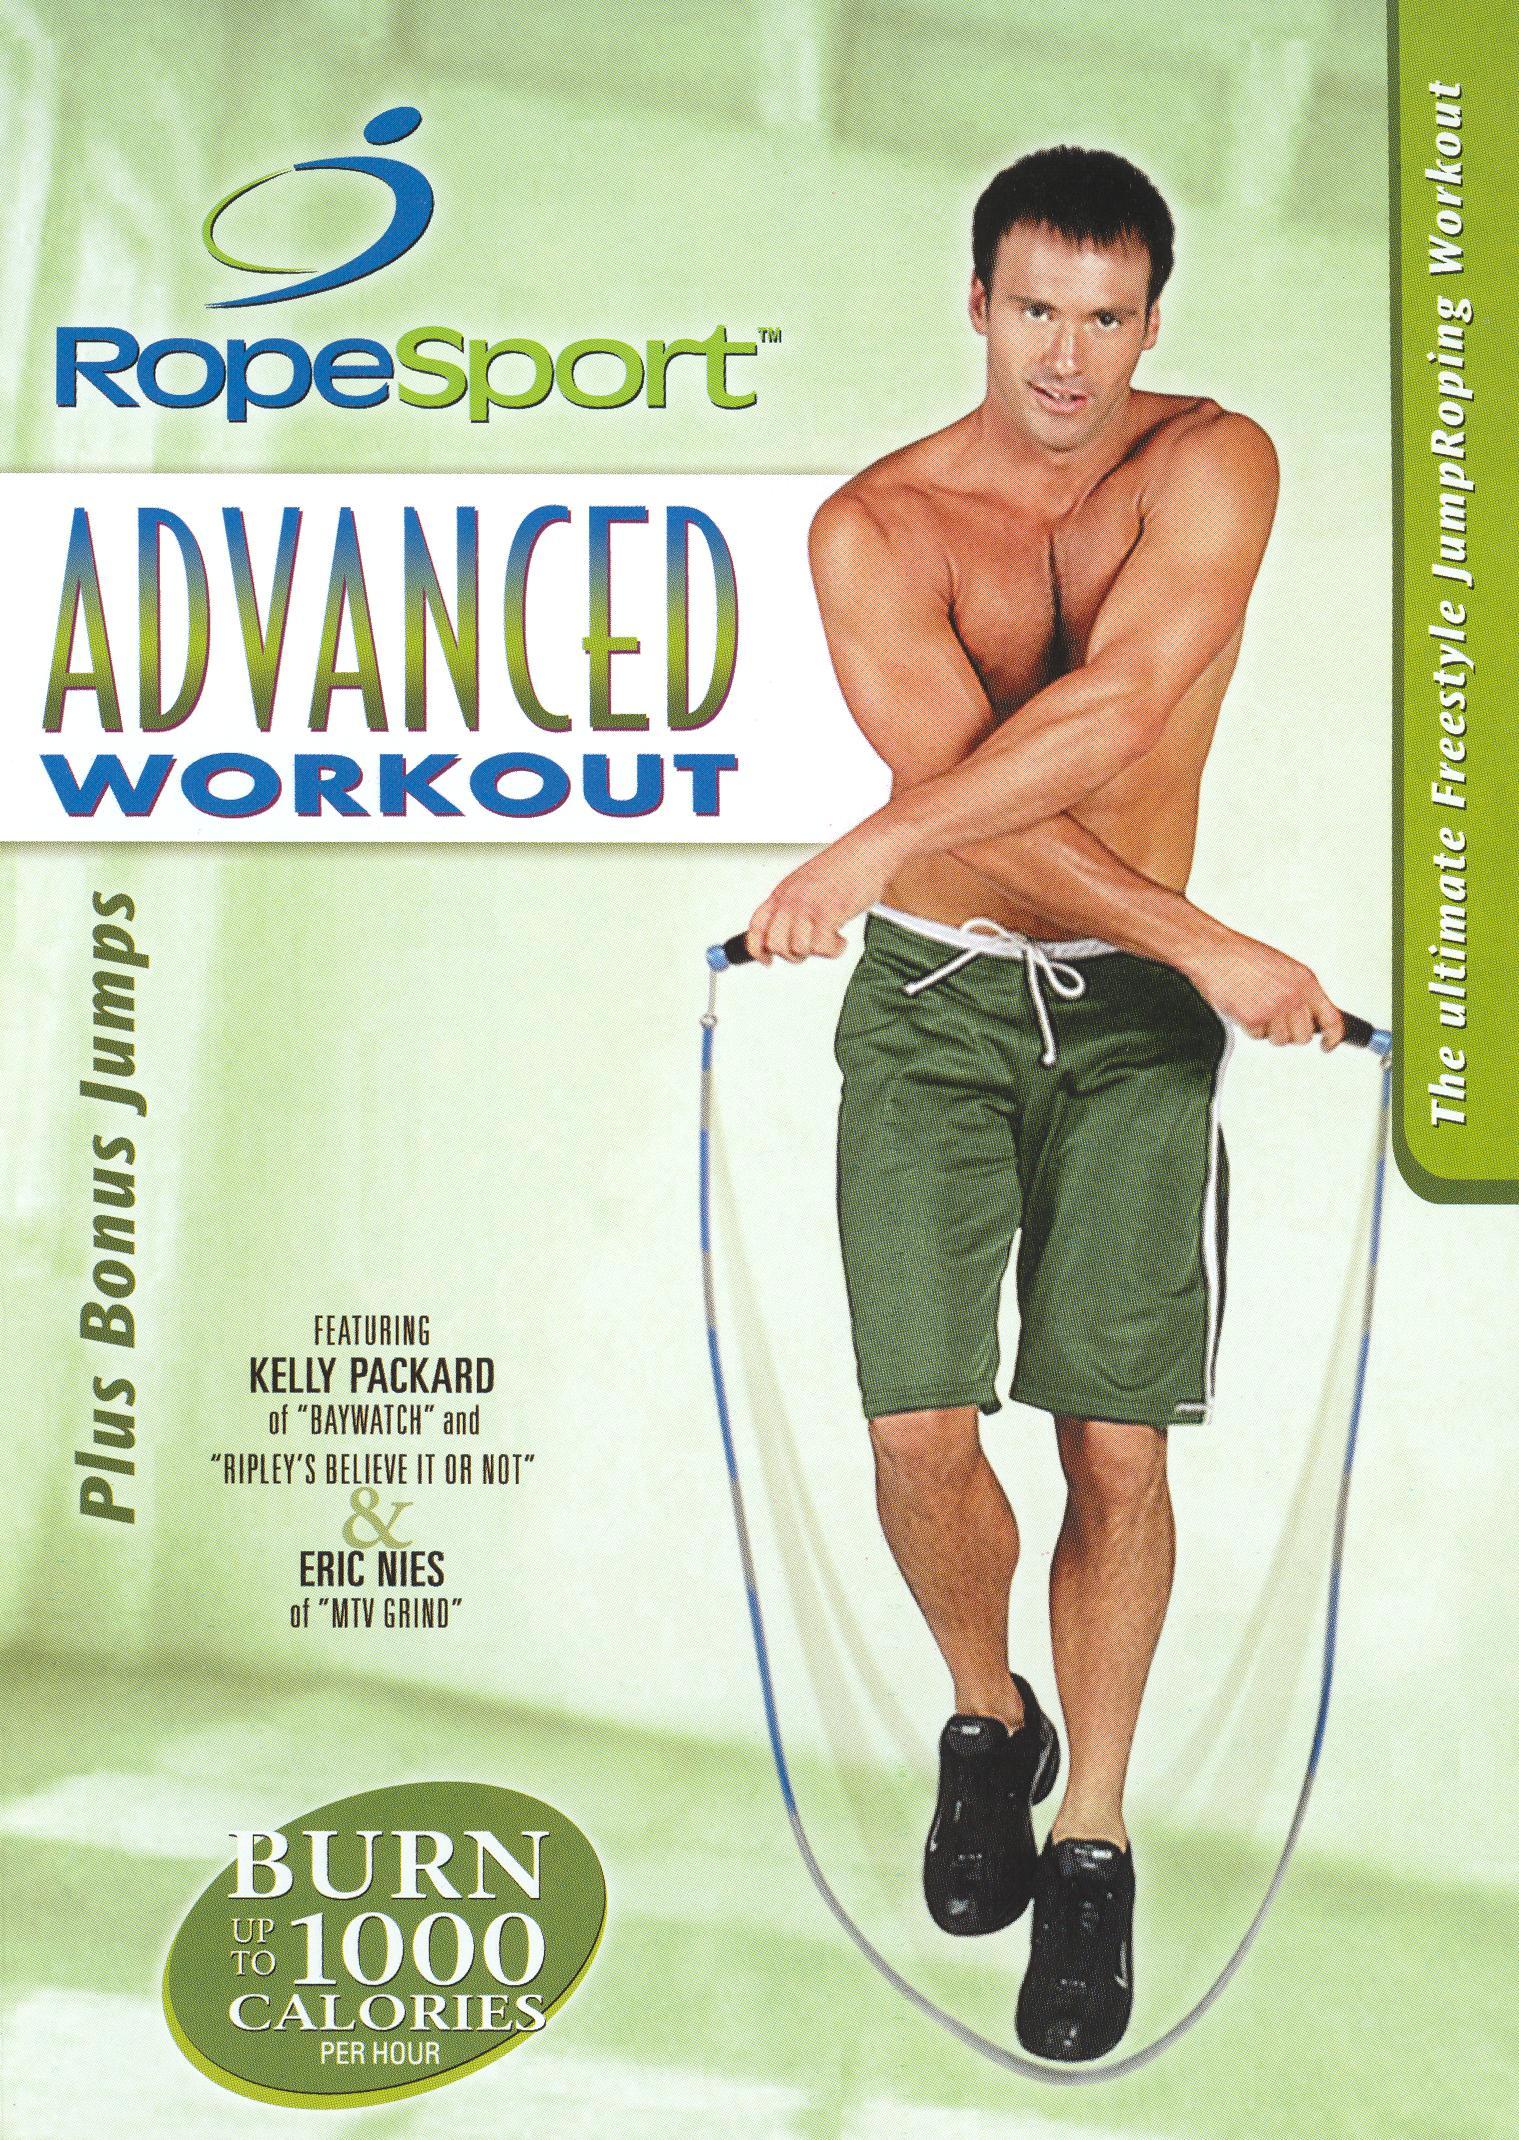 RopeSport: Advanced Workout